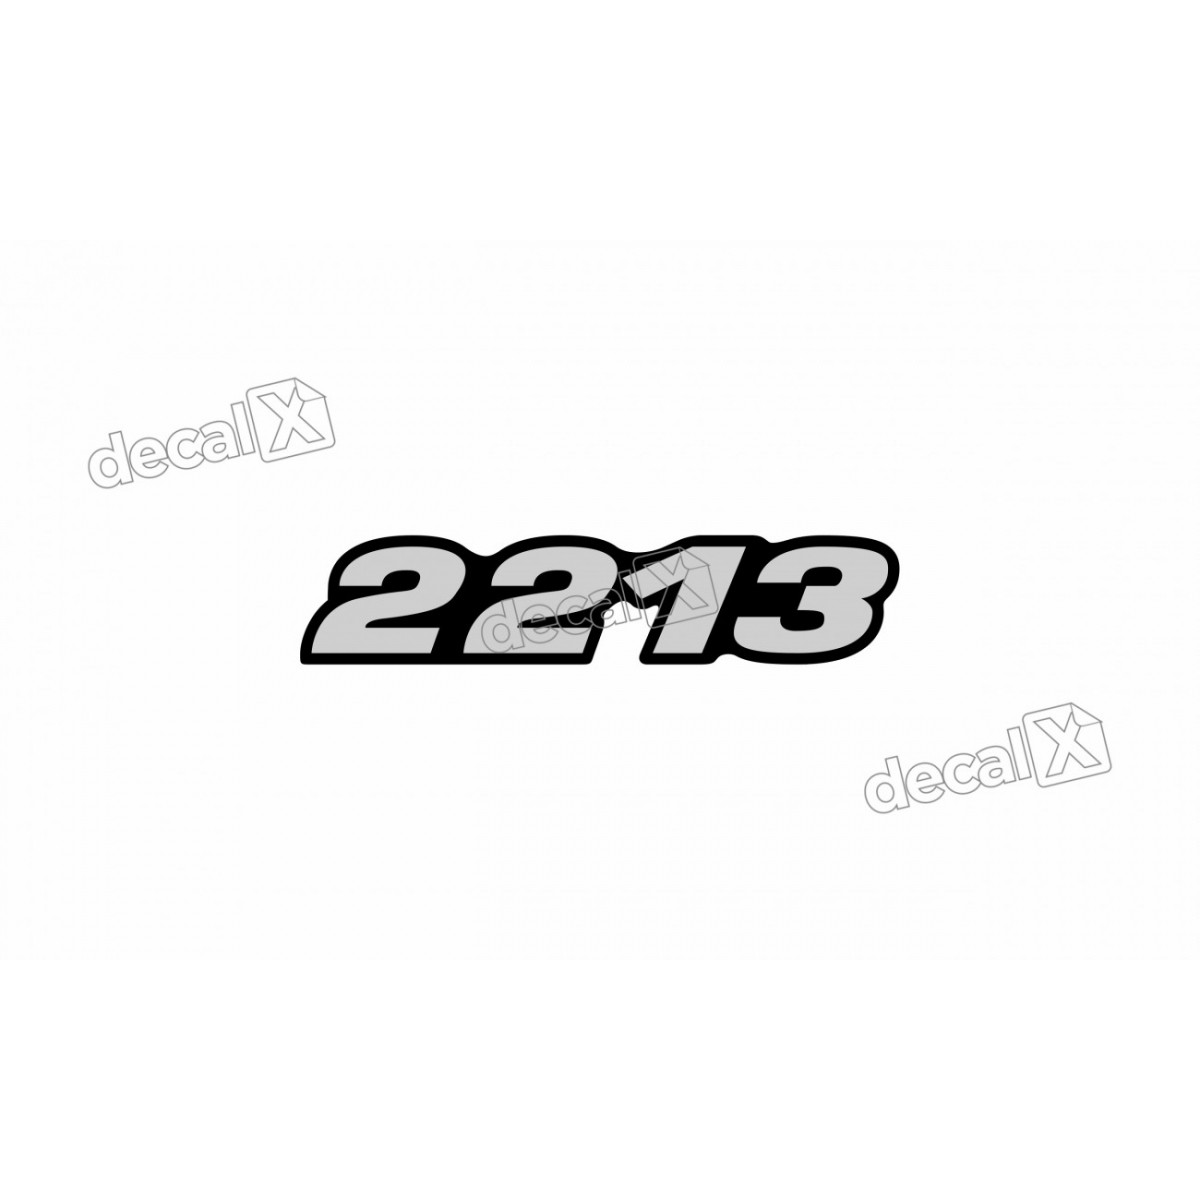 Adesivo Emblema Resinado Mercedes 2213 Cm77 Decalx